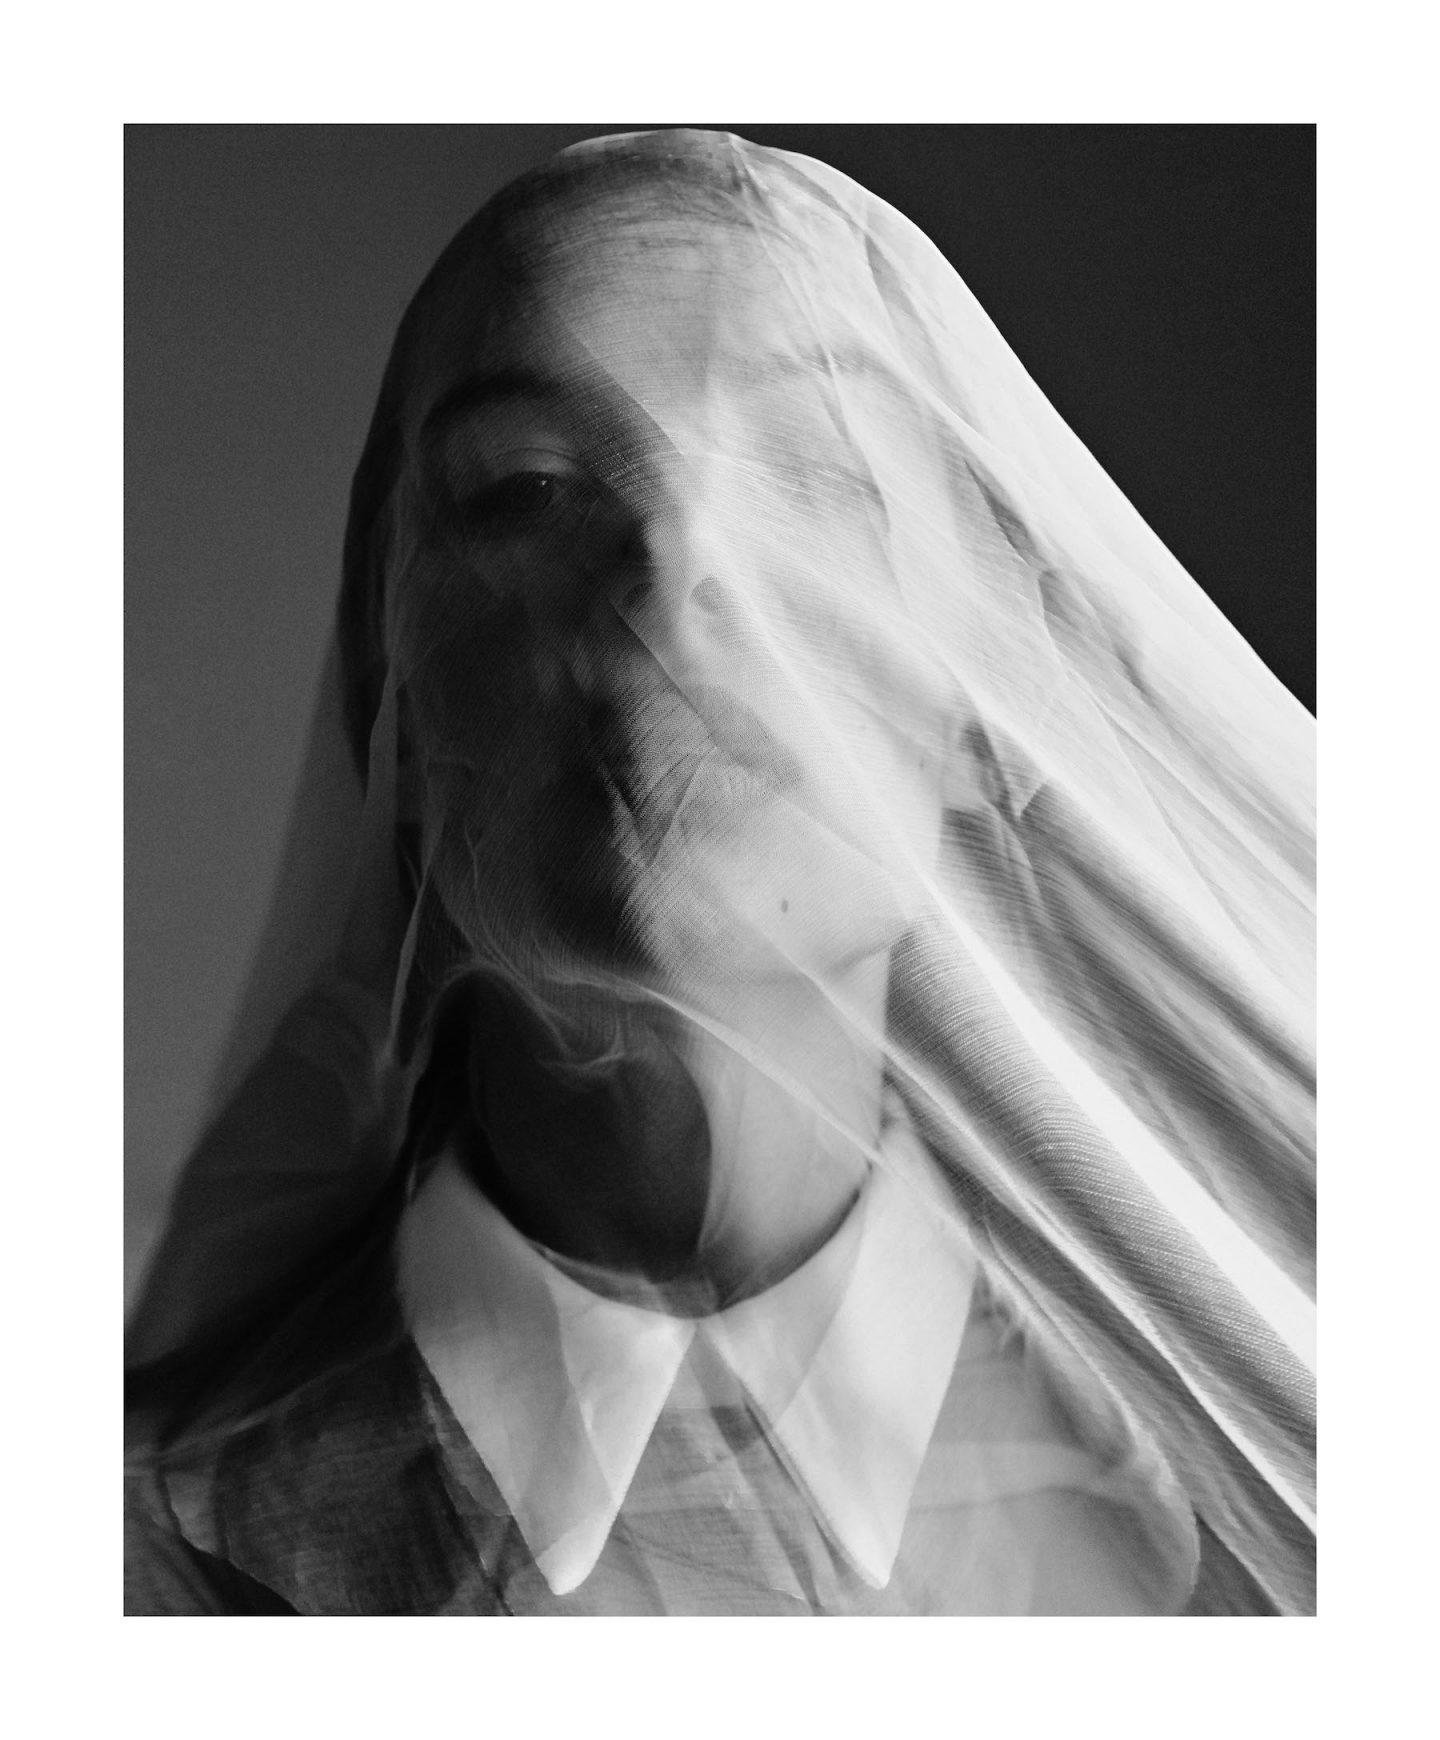 IGNANT-Photography-Michael-Willian-15